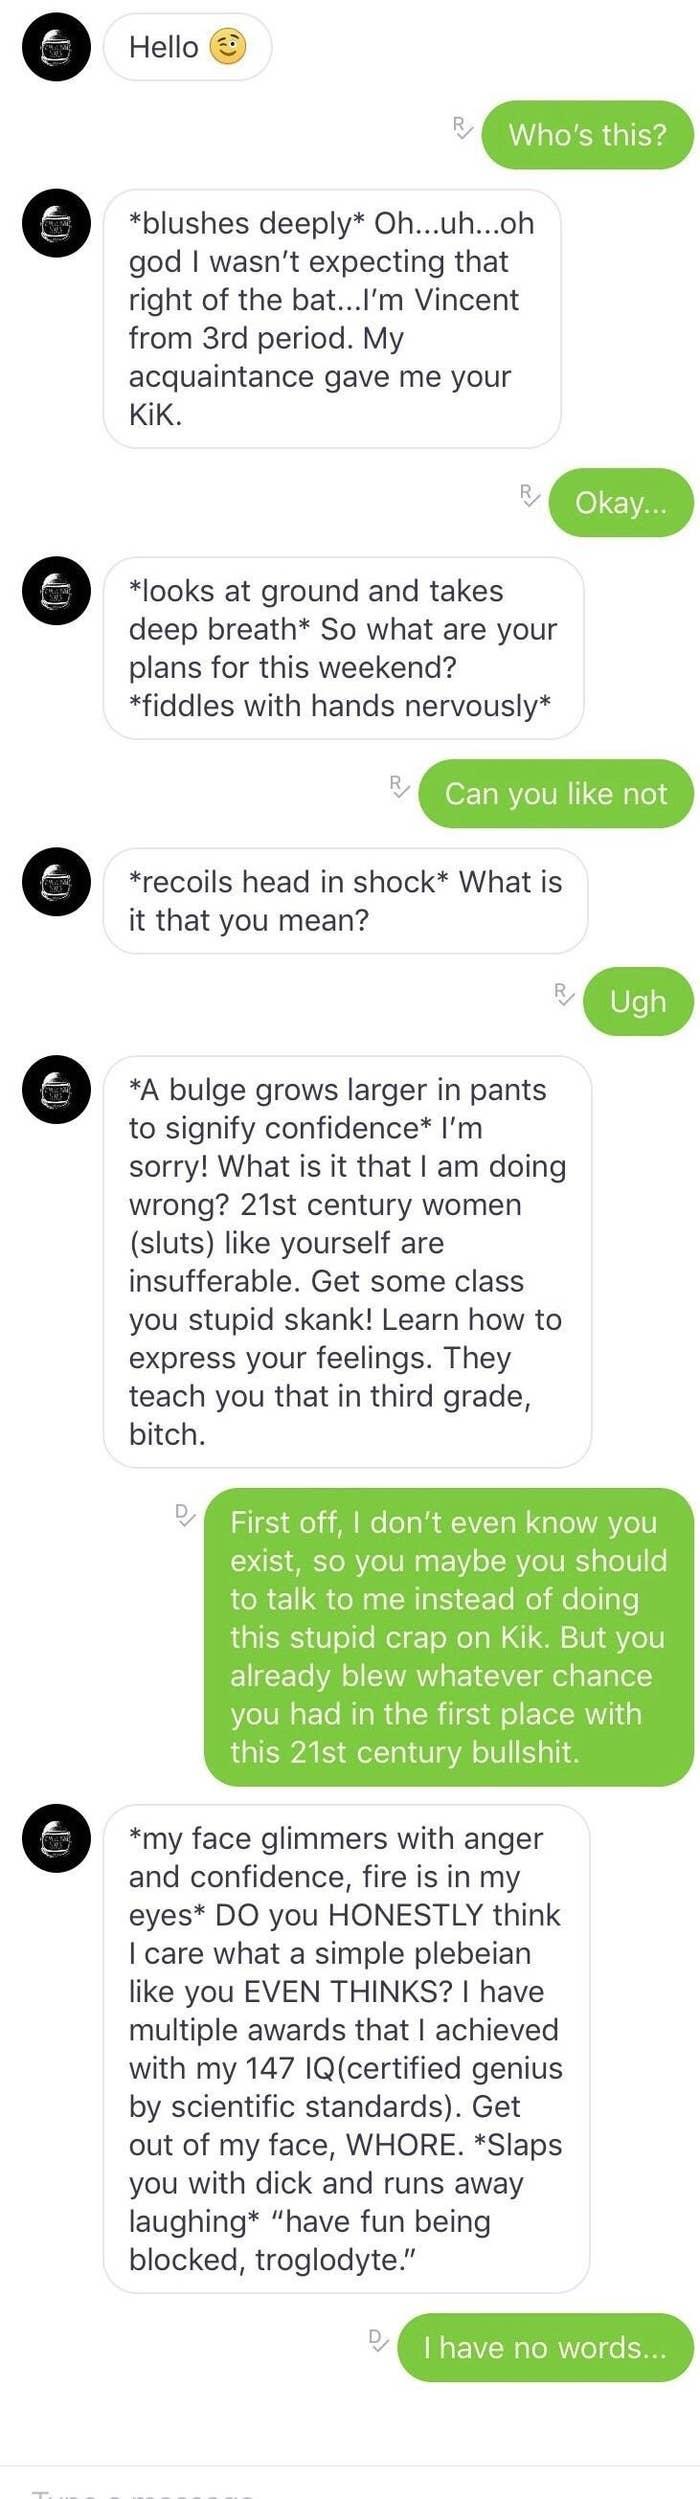 kik kontakte sexting deutsch